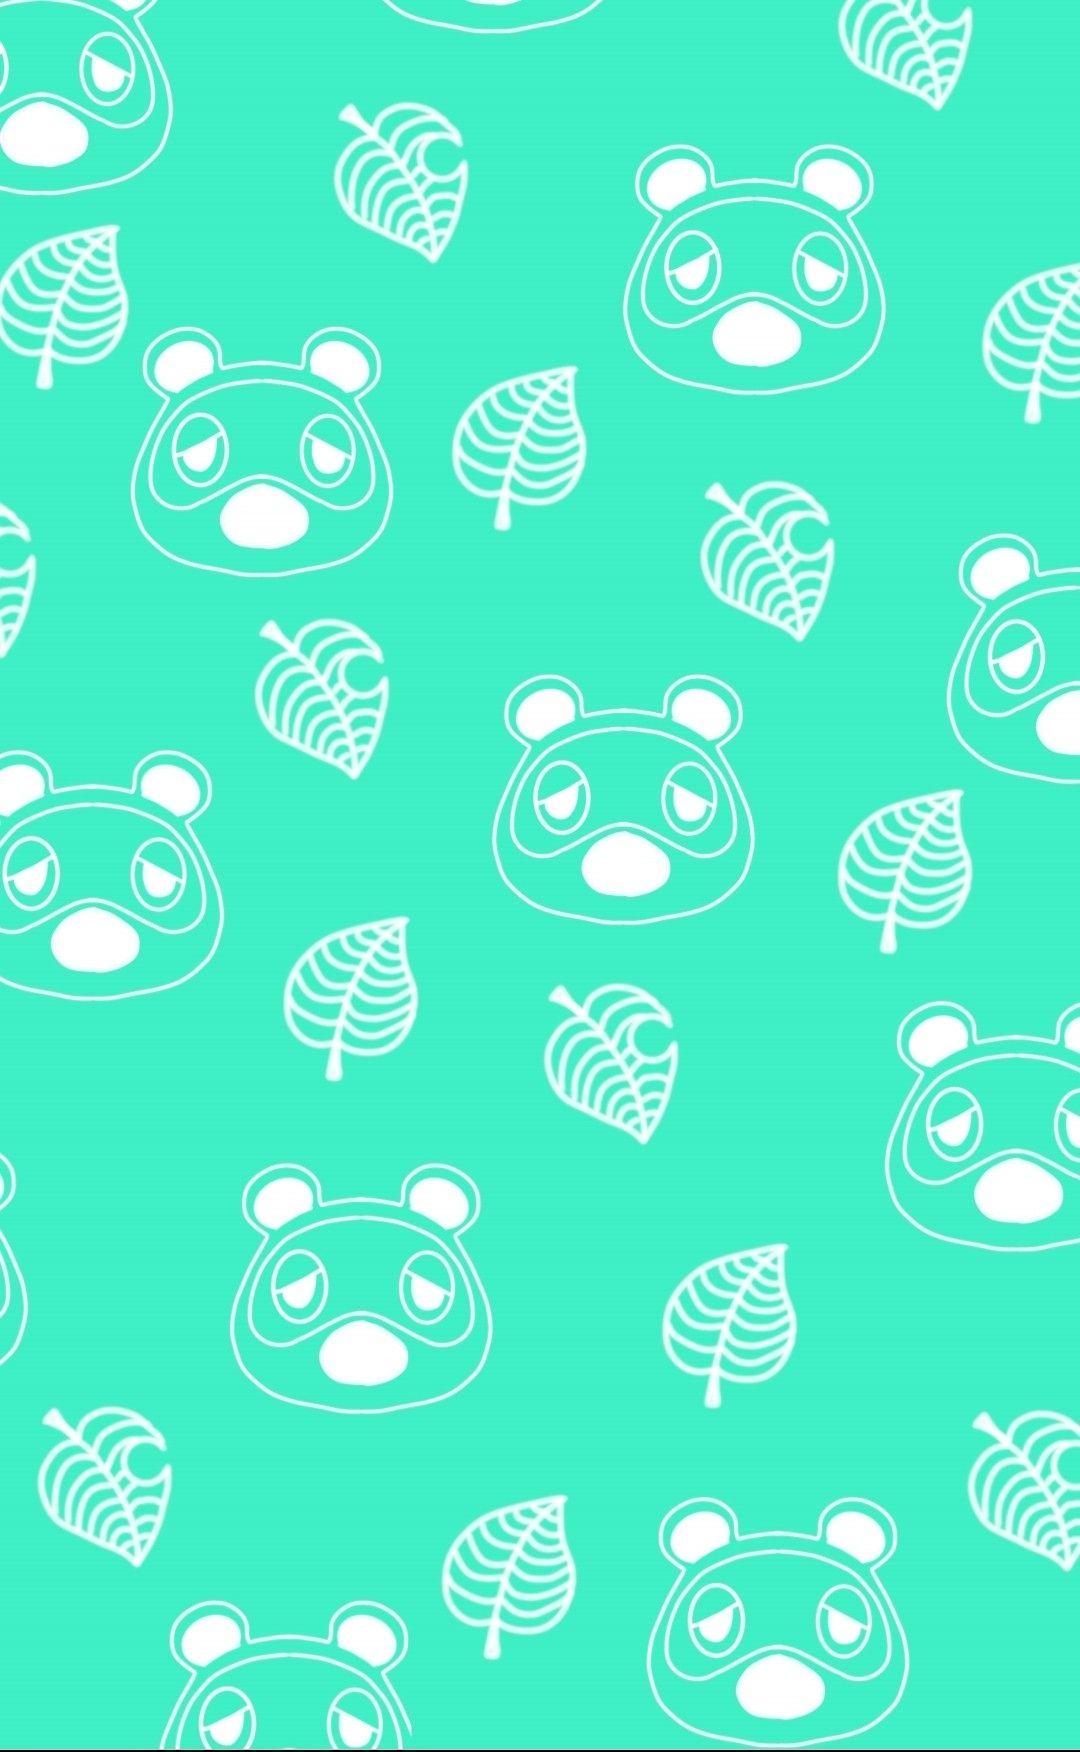 Animal Crossing New Horizons Tom Nook Wallpaper Animal Crossing Green Animals Wallpaper